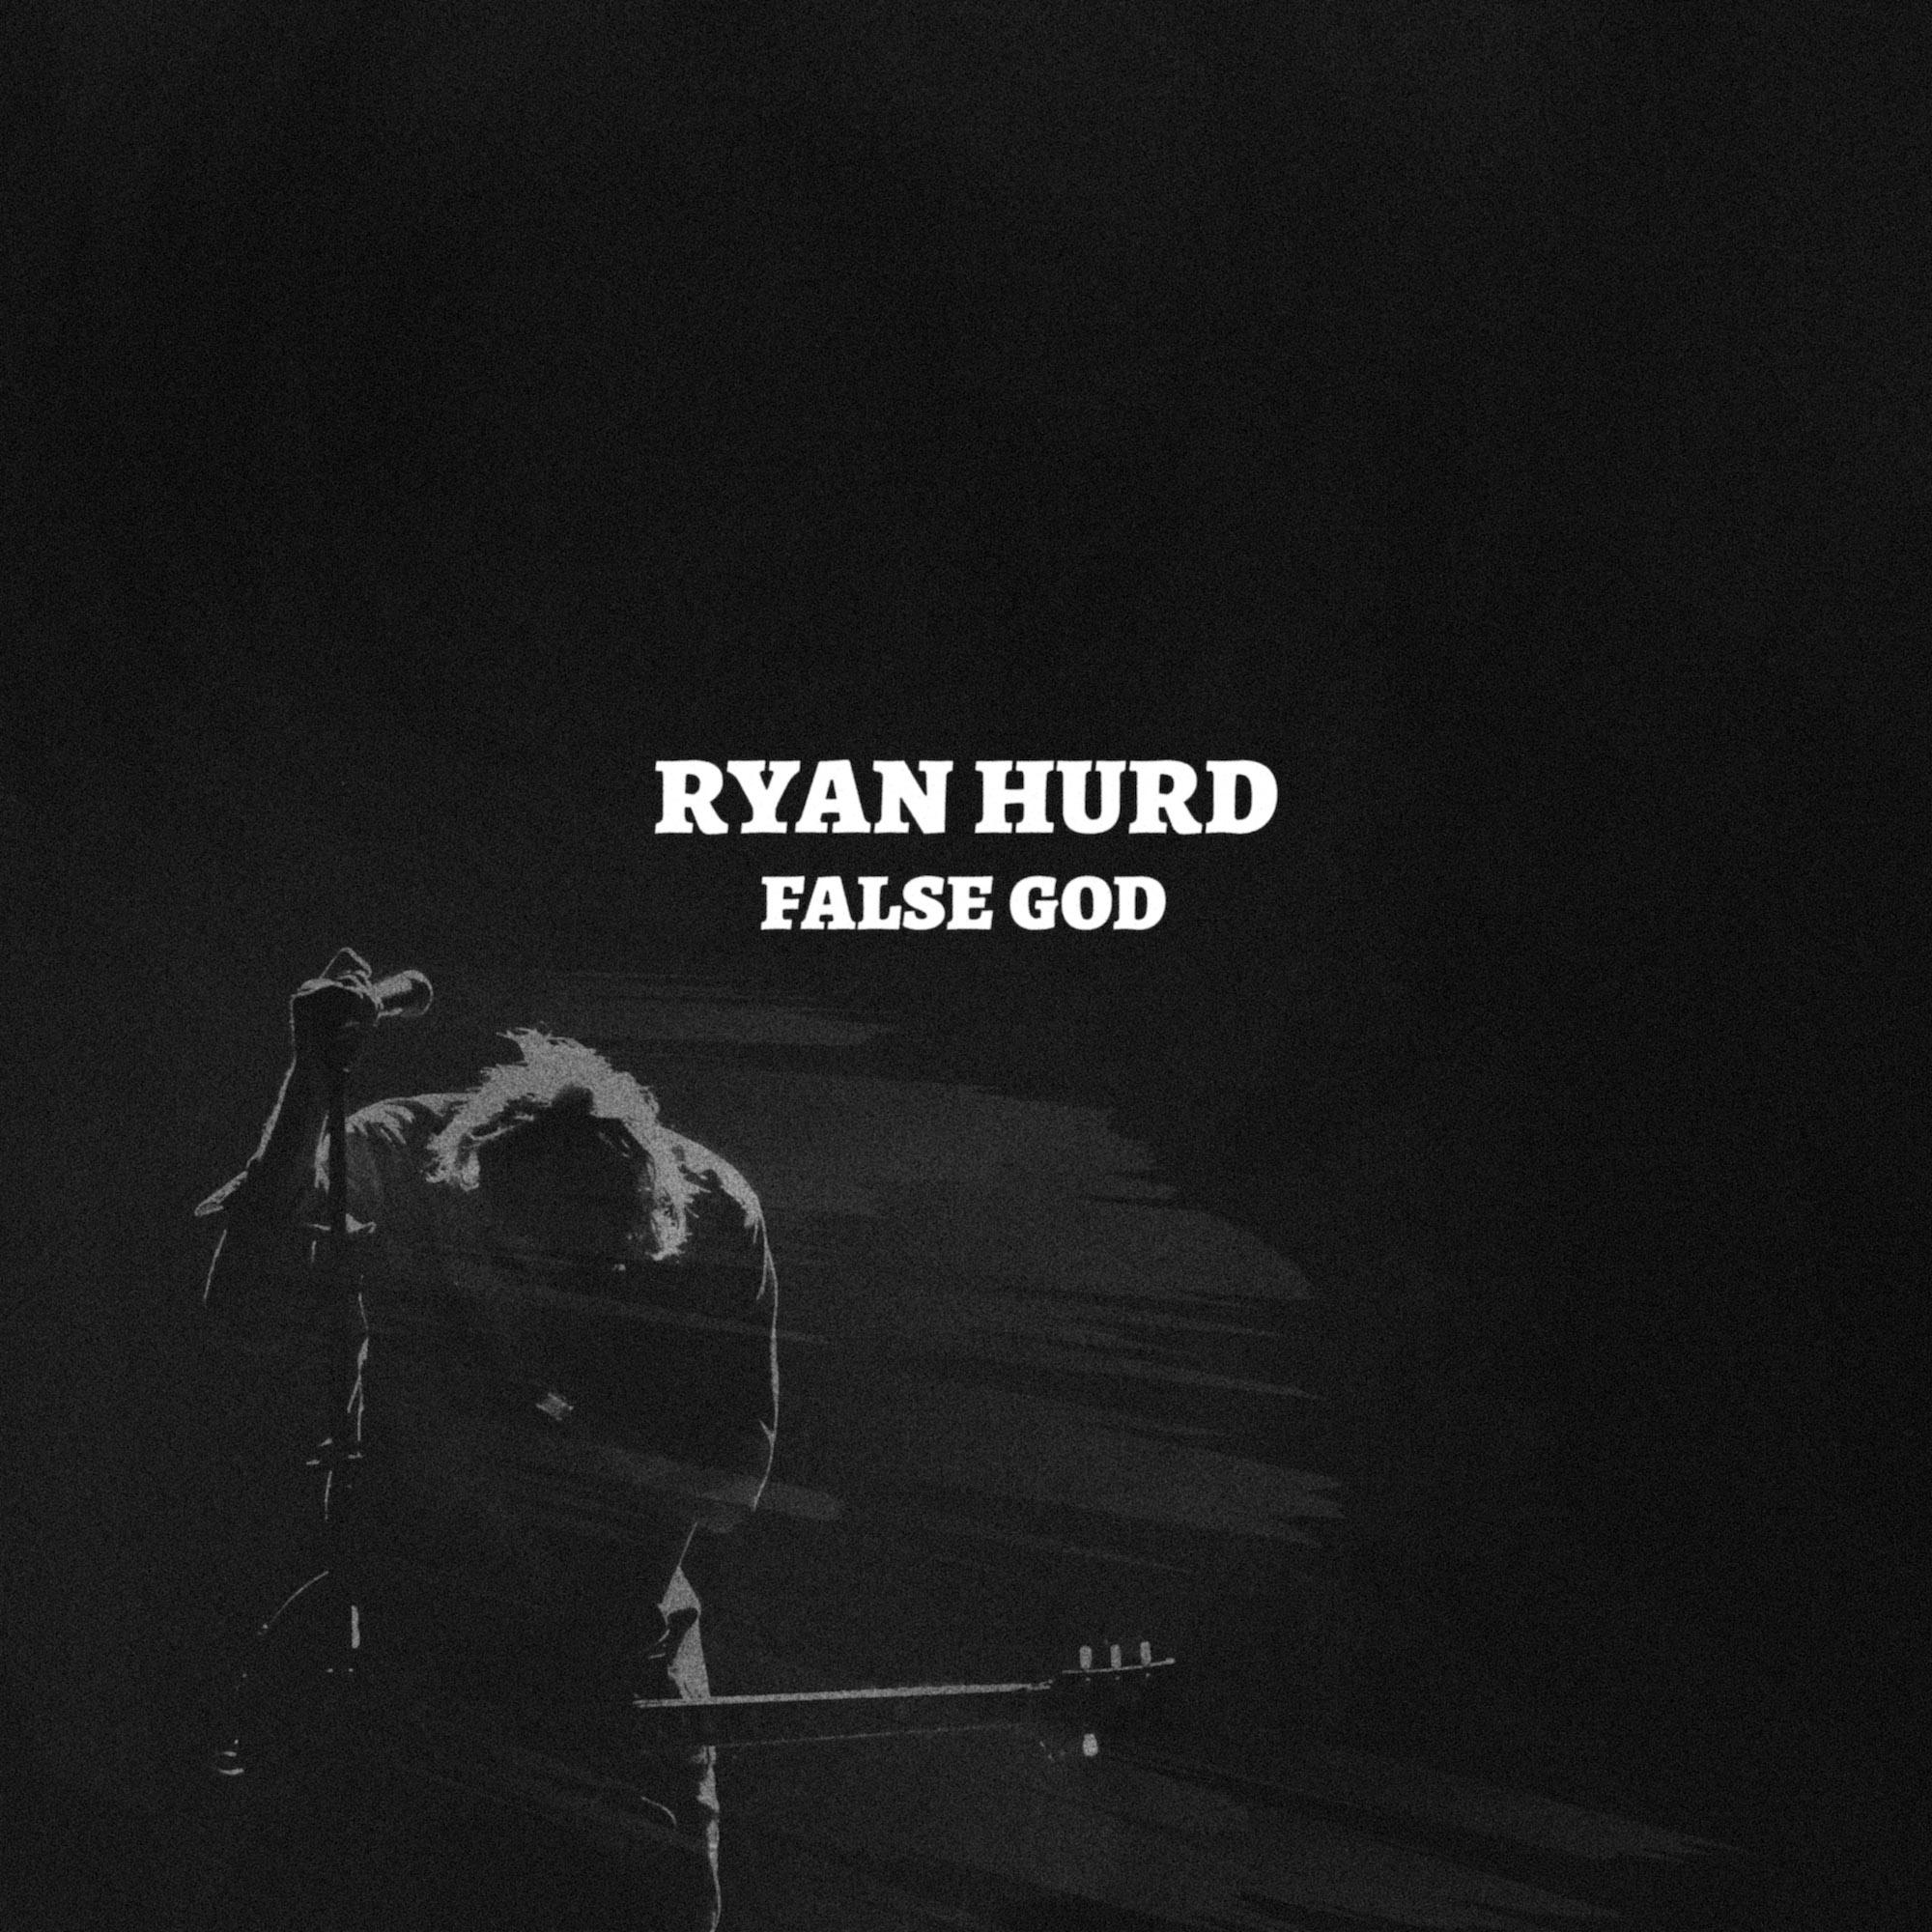 False God (Taylor Swift Cover)